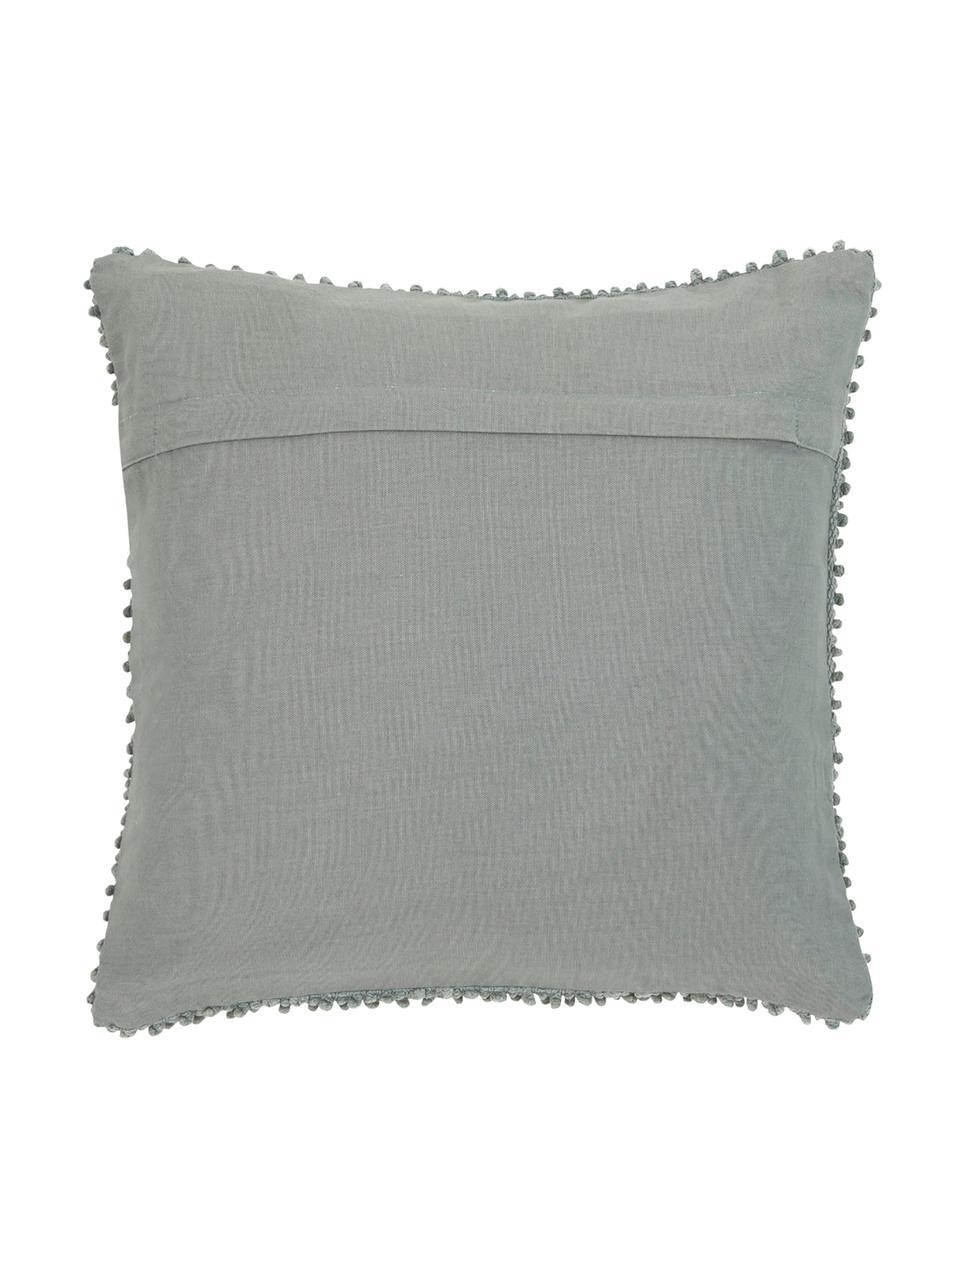 Federa arredo in cotone verde salvia Indi, 100% cotone, Verde salvia, Larg. 45 x Lung. 45 cm